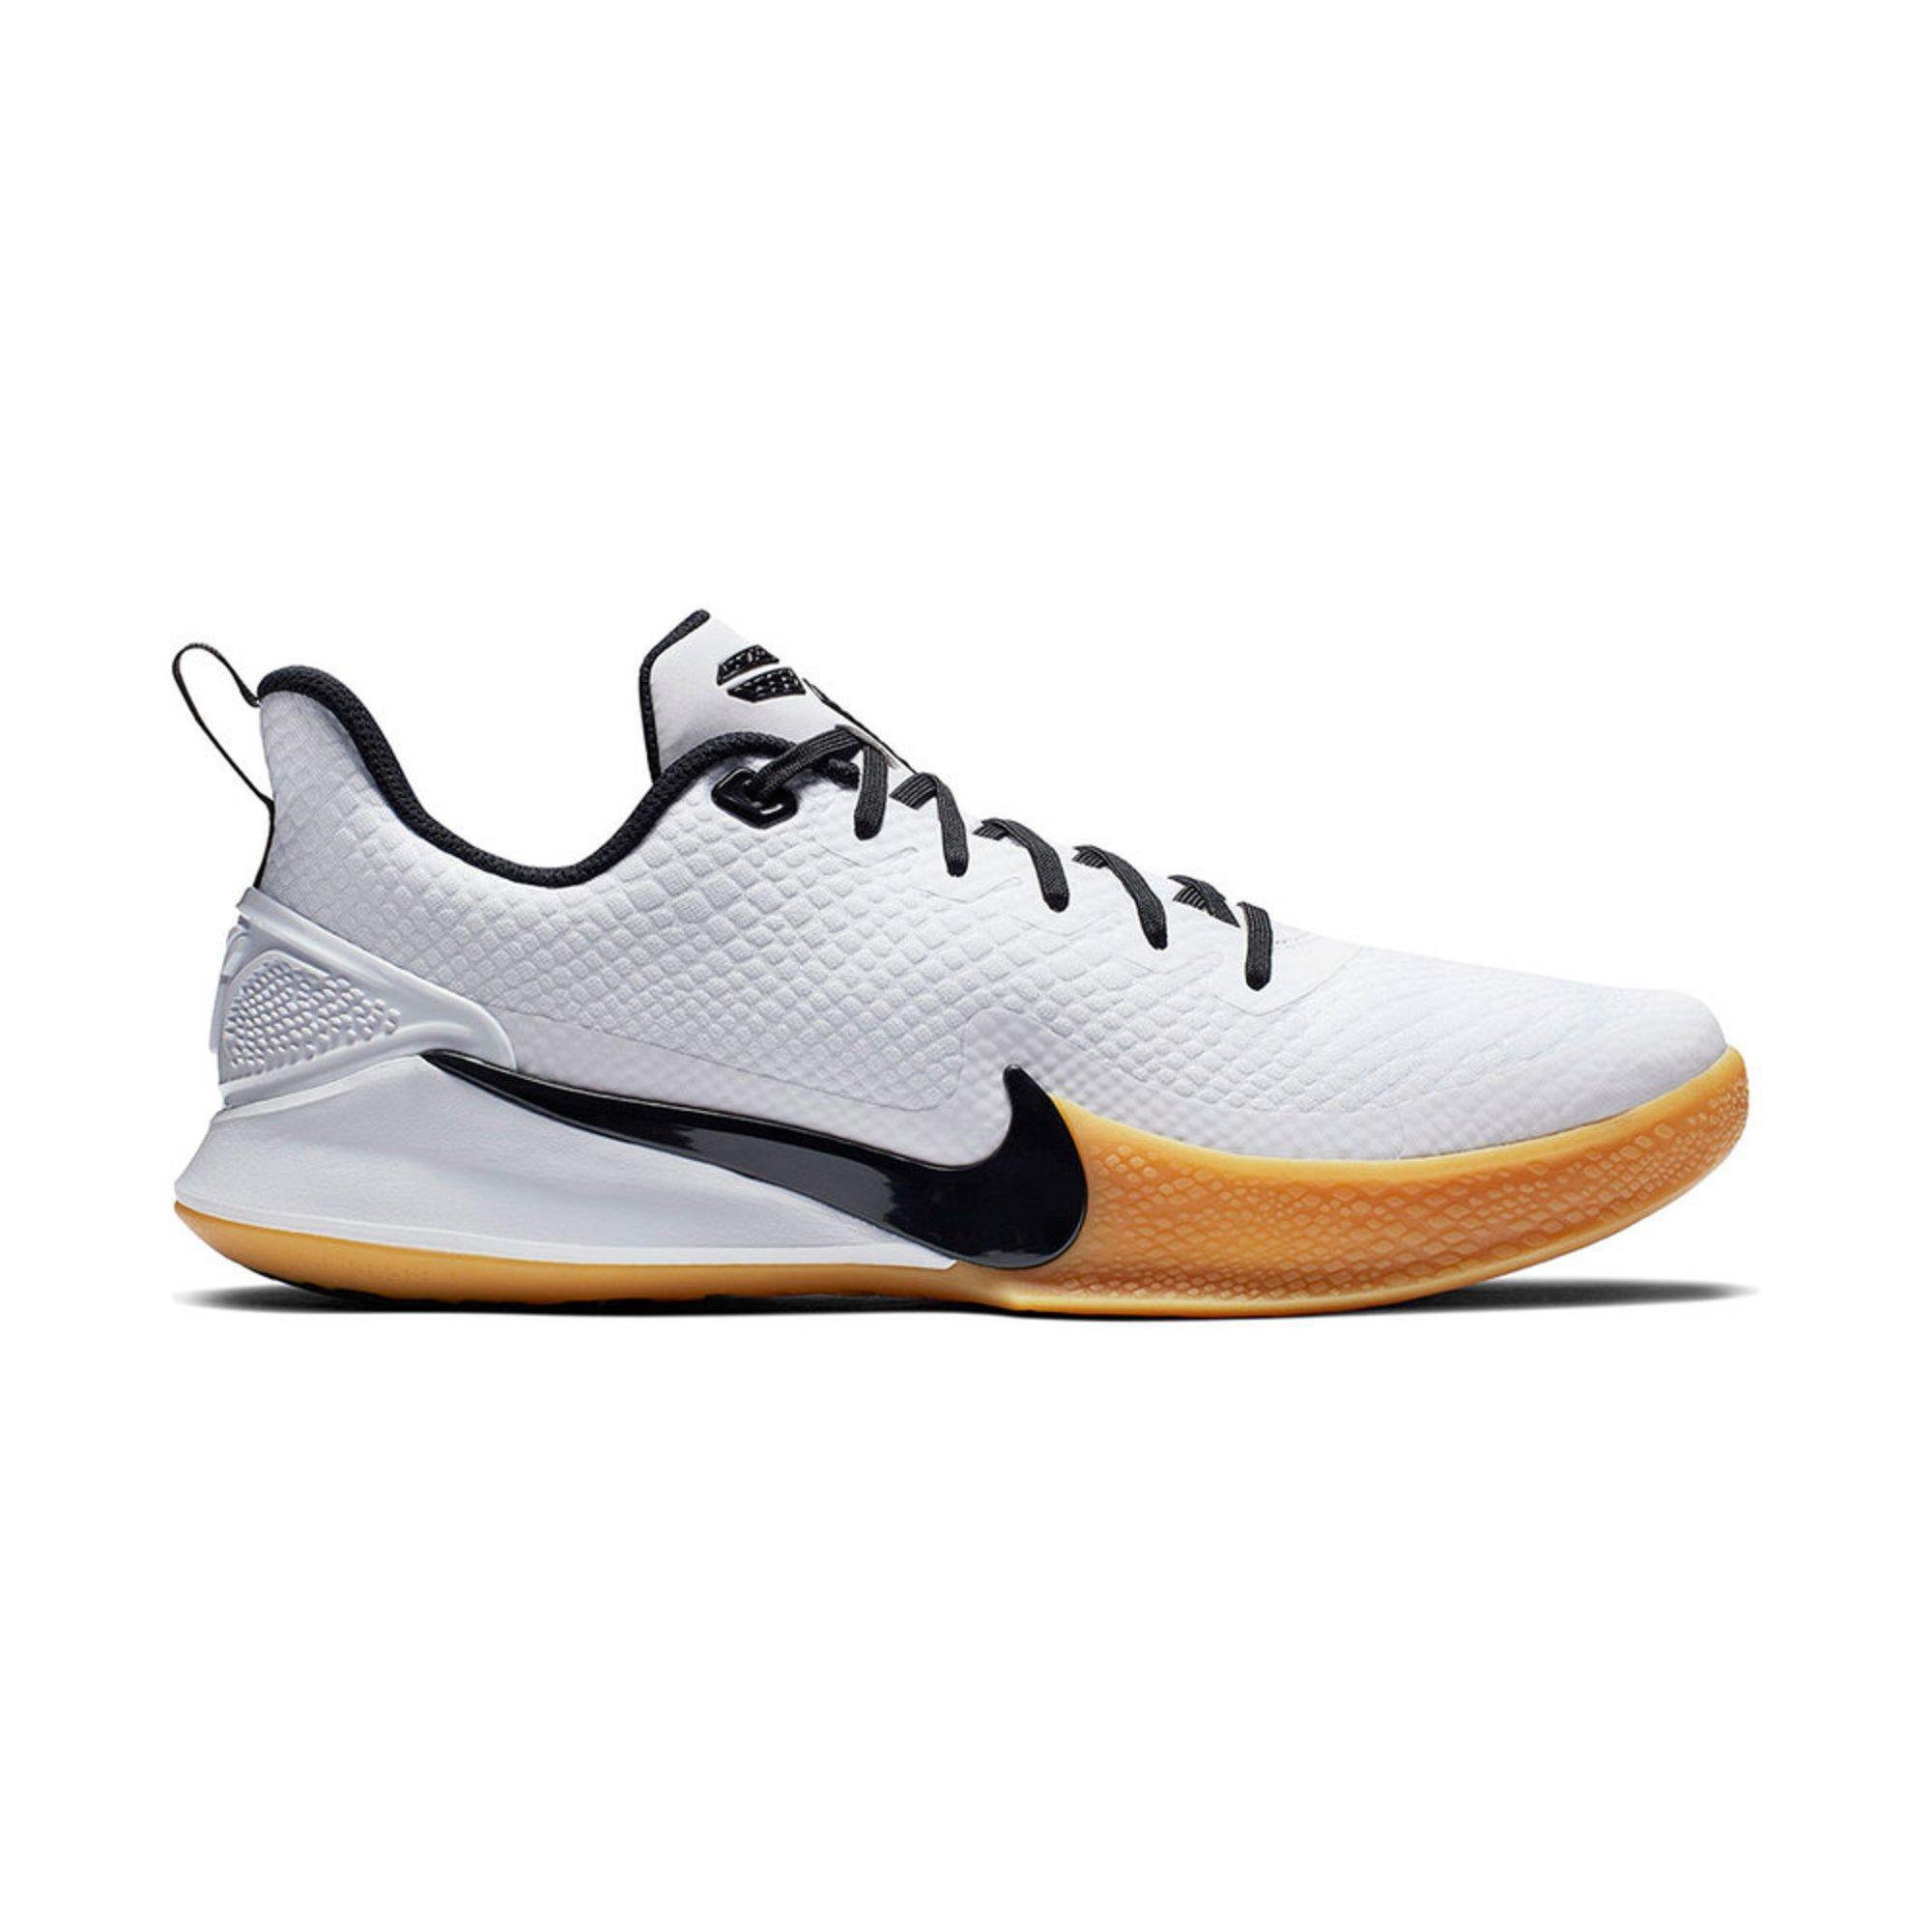 Basketball Men's ShoeShoes Focus Nike Mamba NZ8wOnPk0X